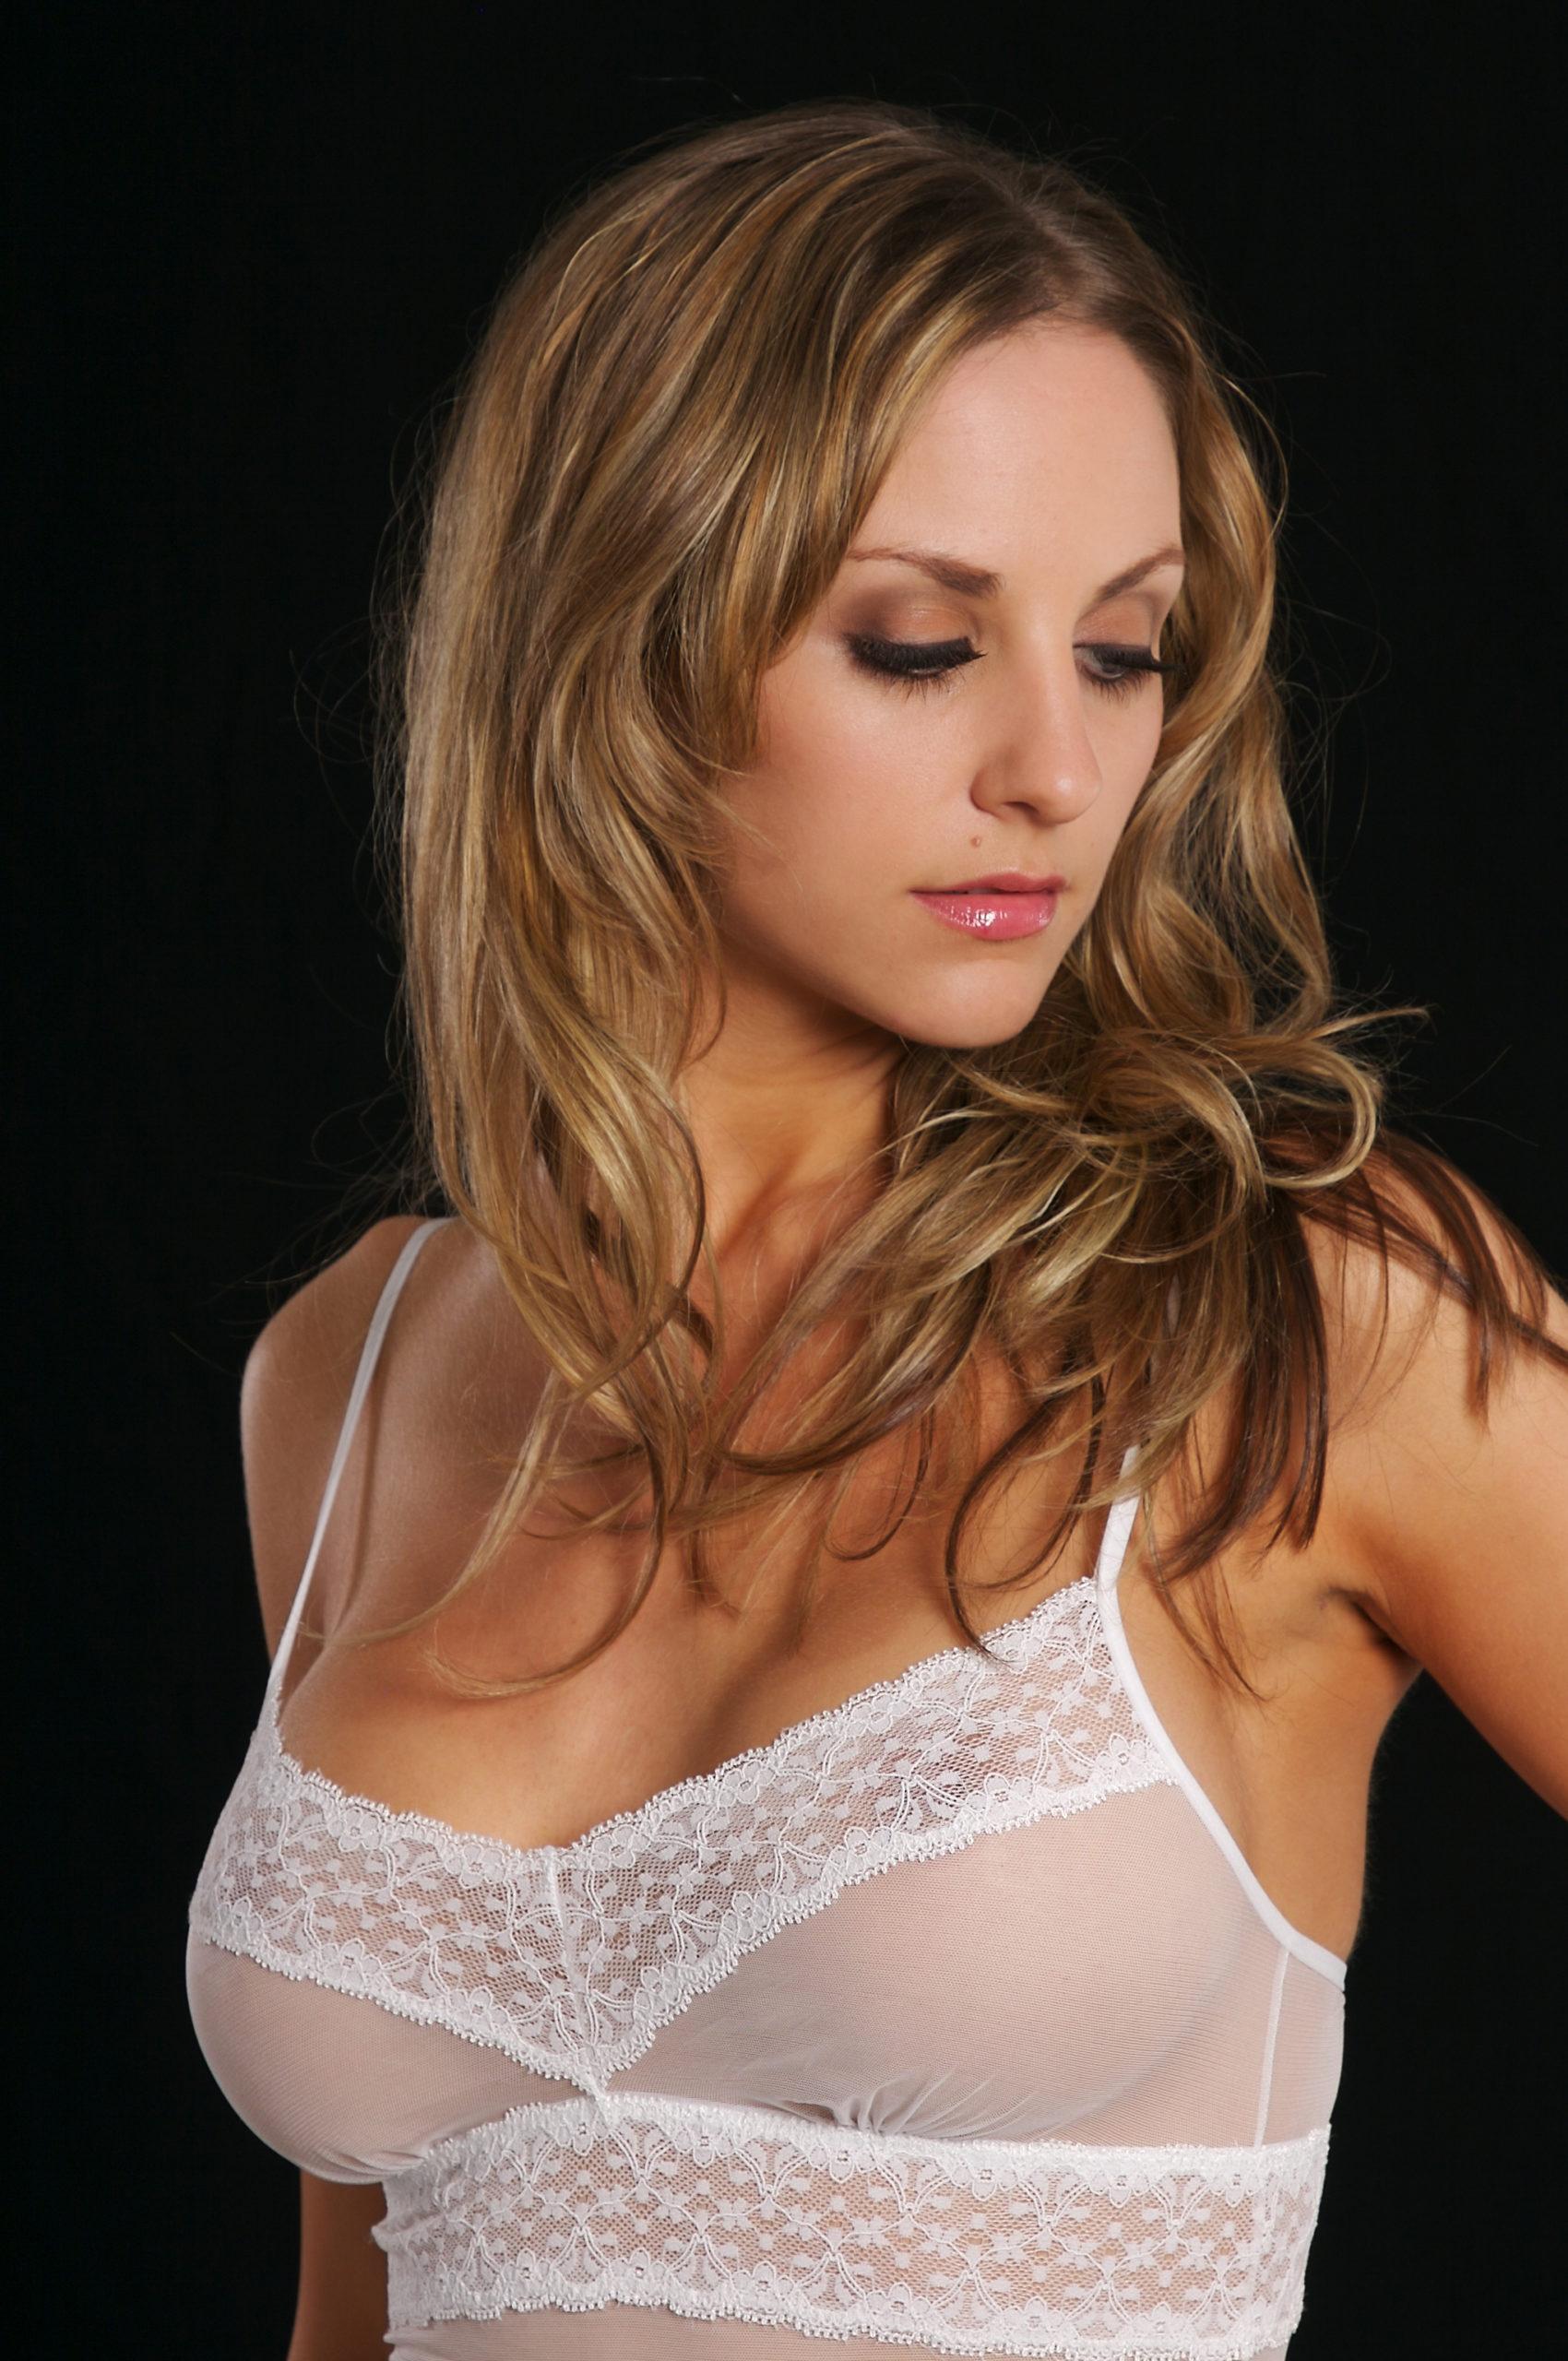 augmentation mammaire resultat. Dr Veber